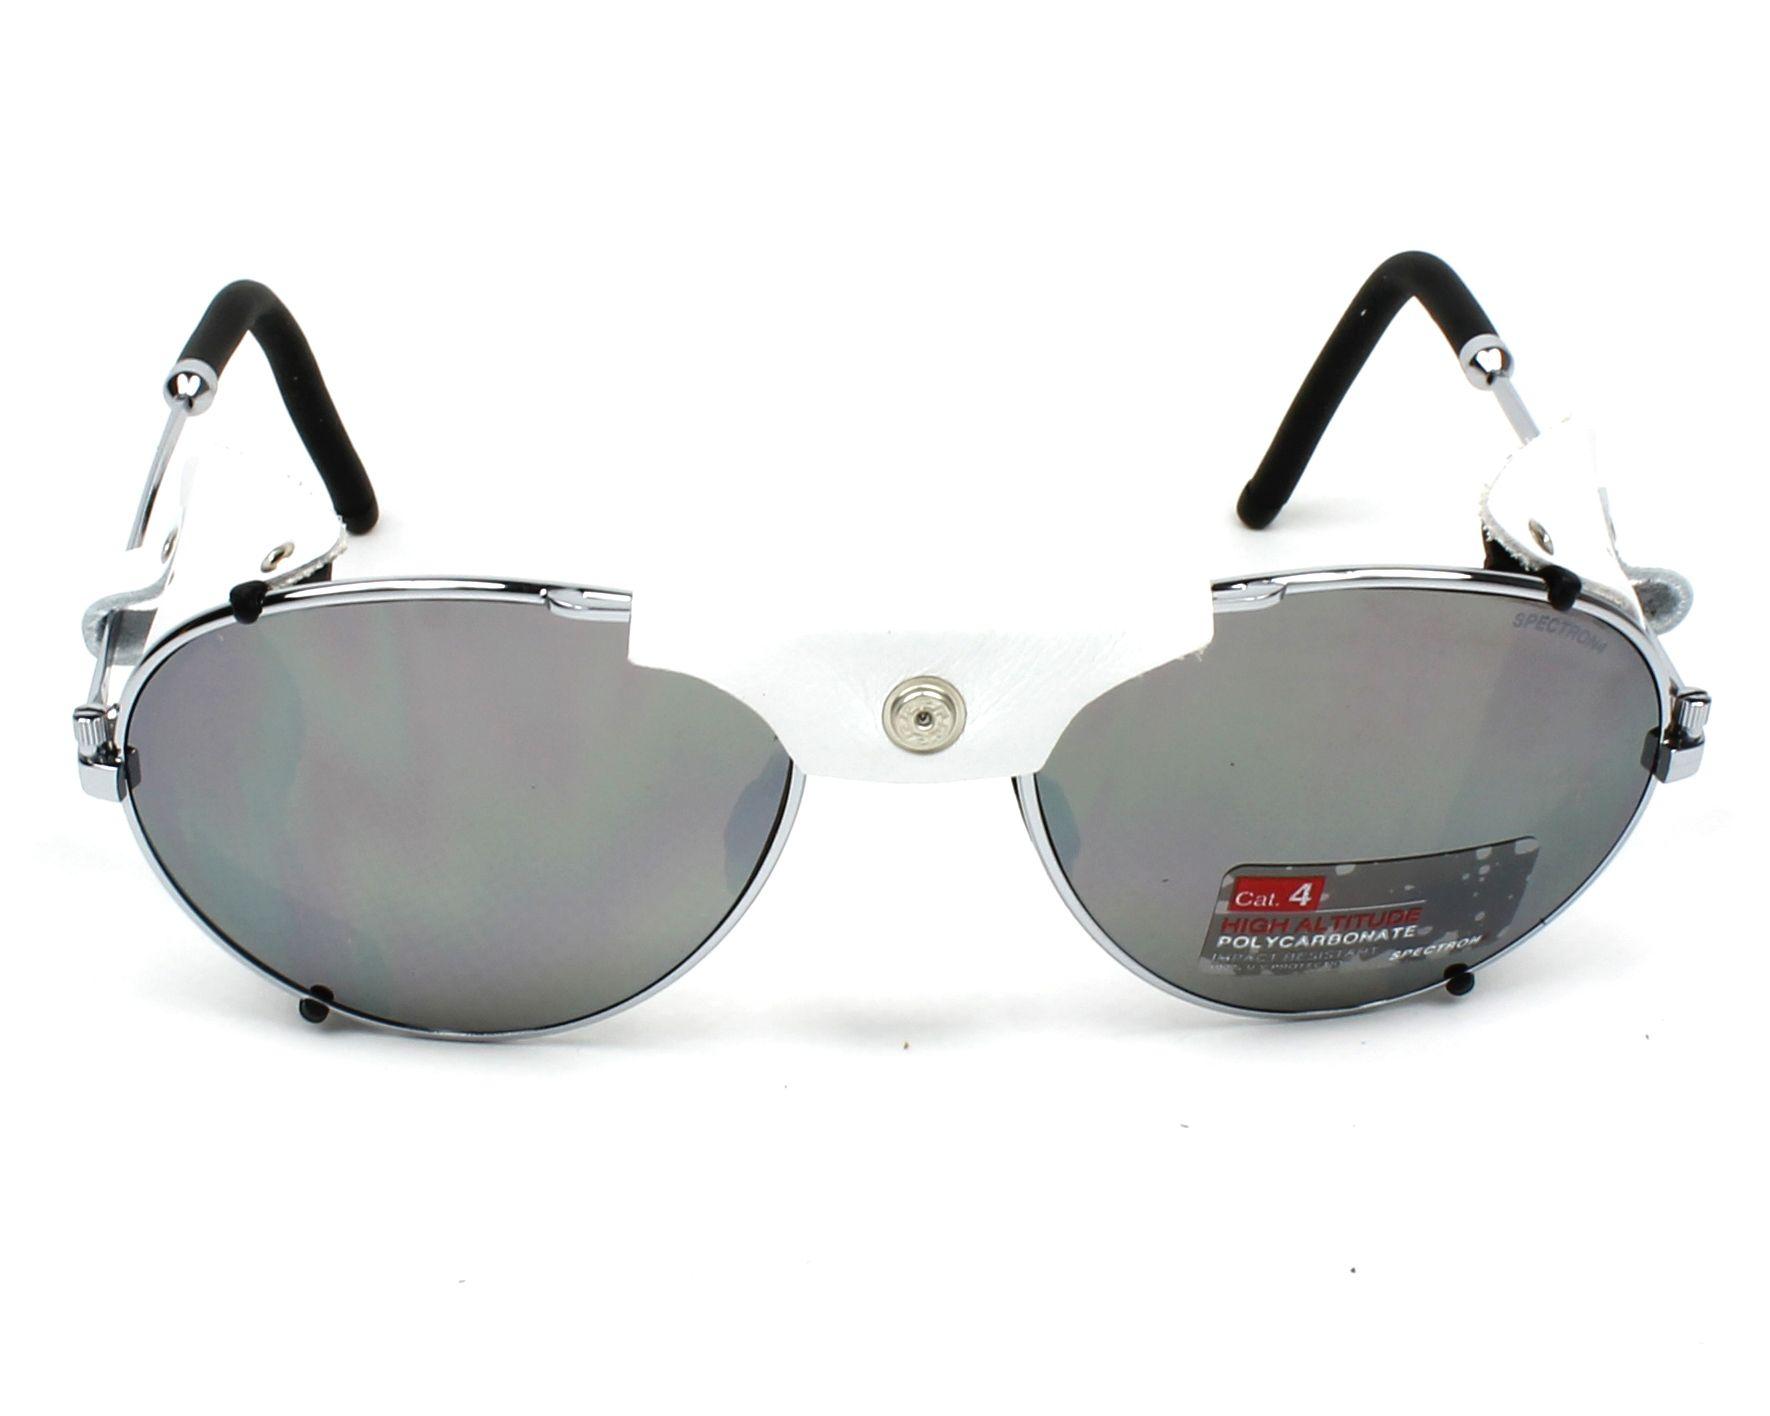 a7fbd8b8c3 Sunglasses Julbo J020 1221 58-19 Gun White front view